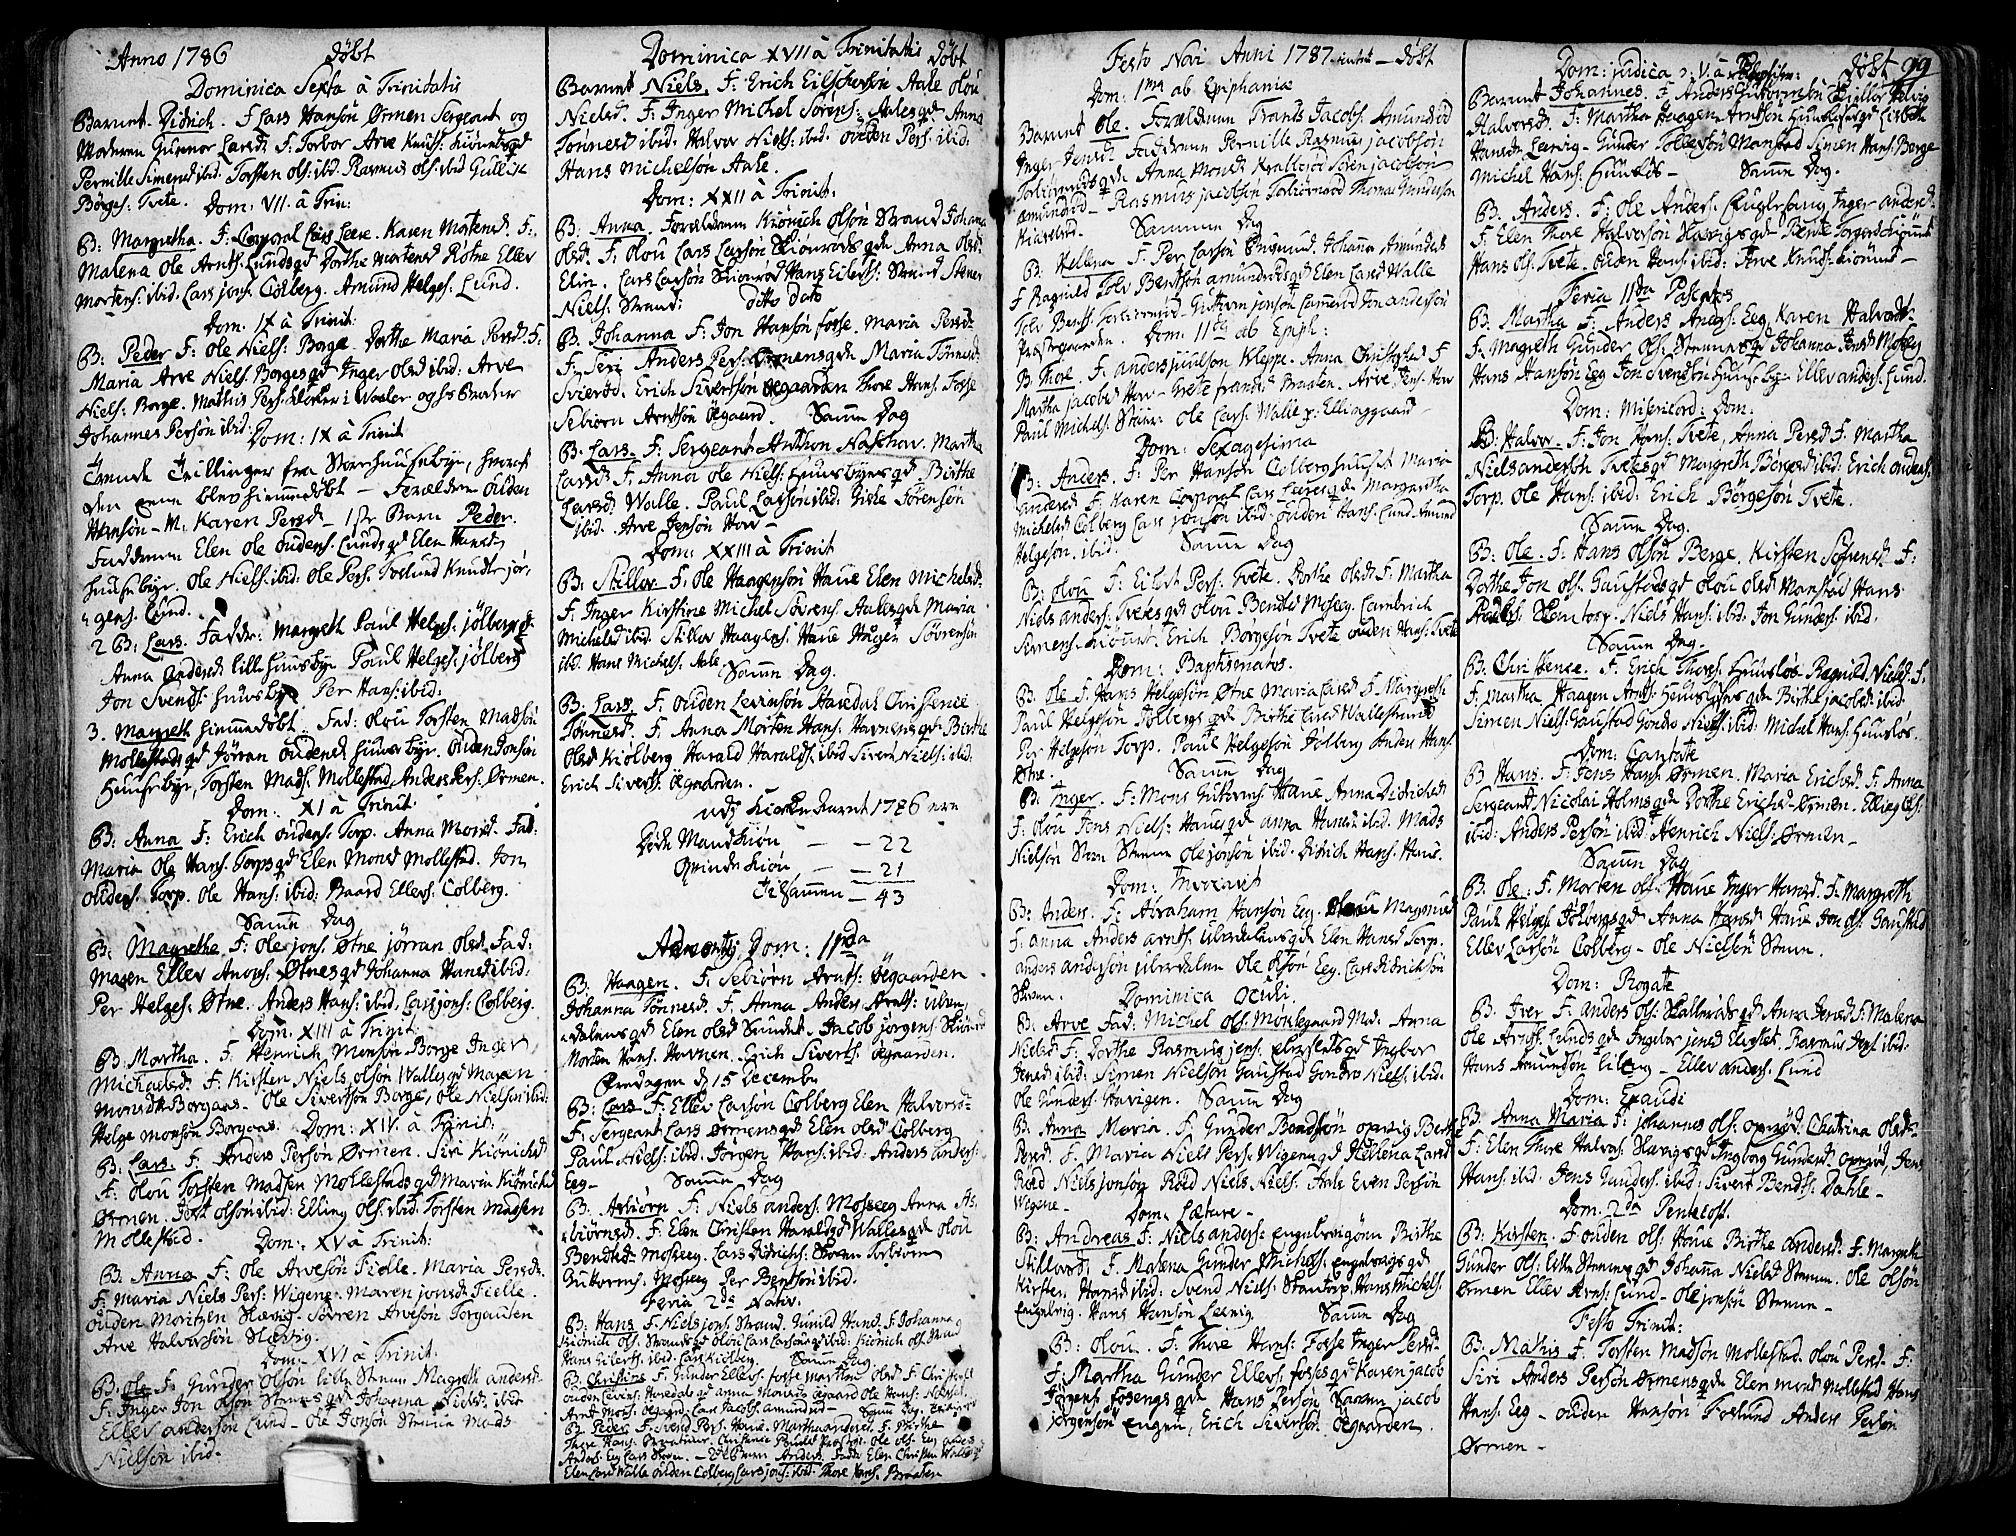 SAO, Onsøy prestekontor Kirkebøker, F/Fa/L0001: Ministerialbok nr. I 1, 1733-1814, s. 99